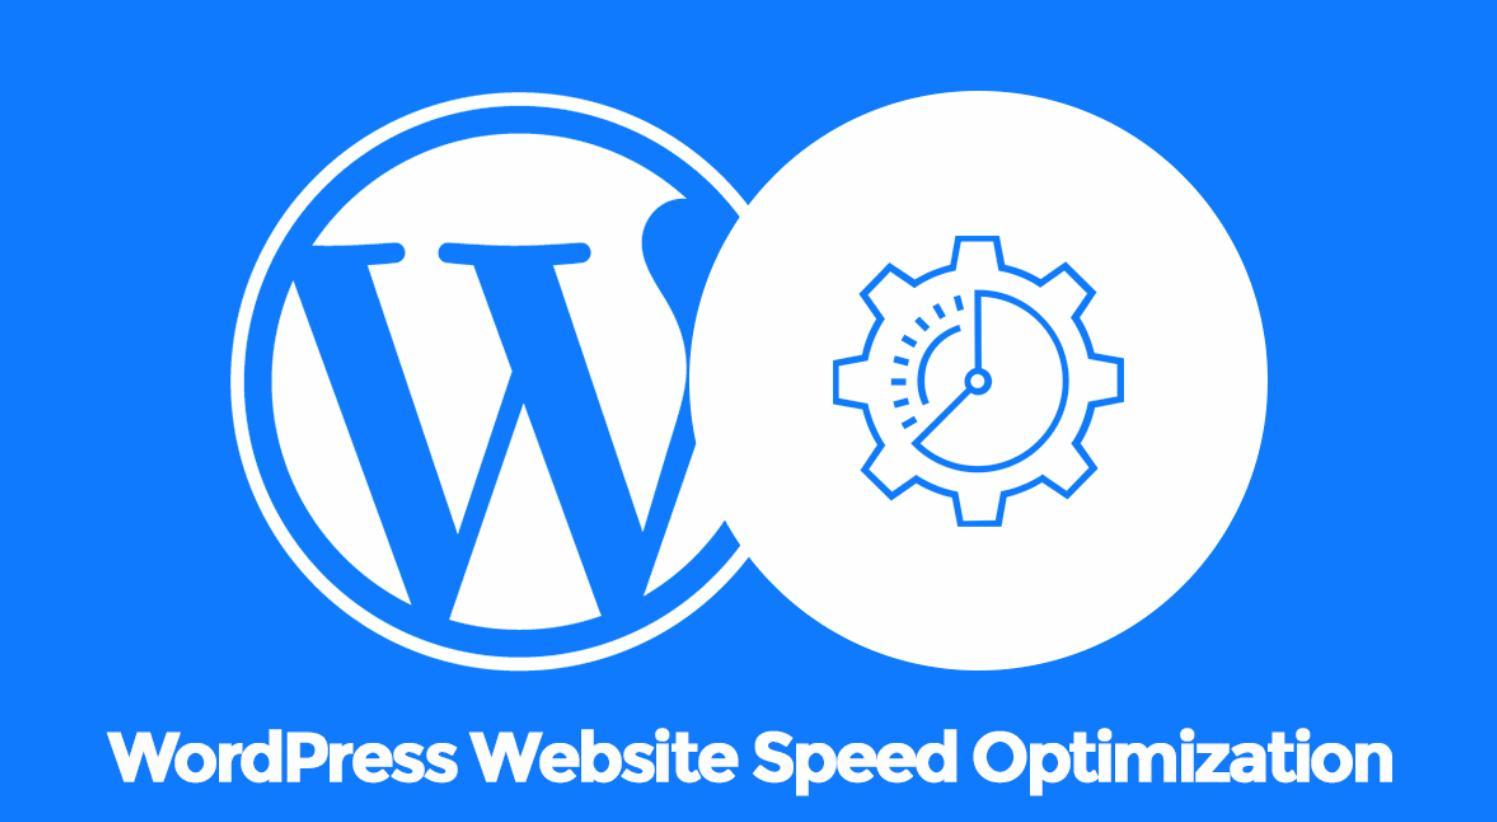 How do I speed up my WordPress website?